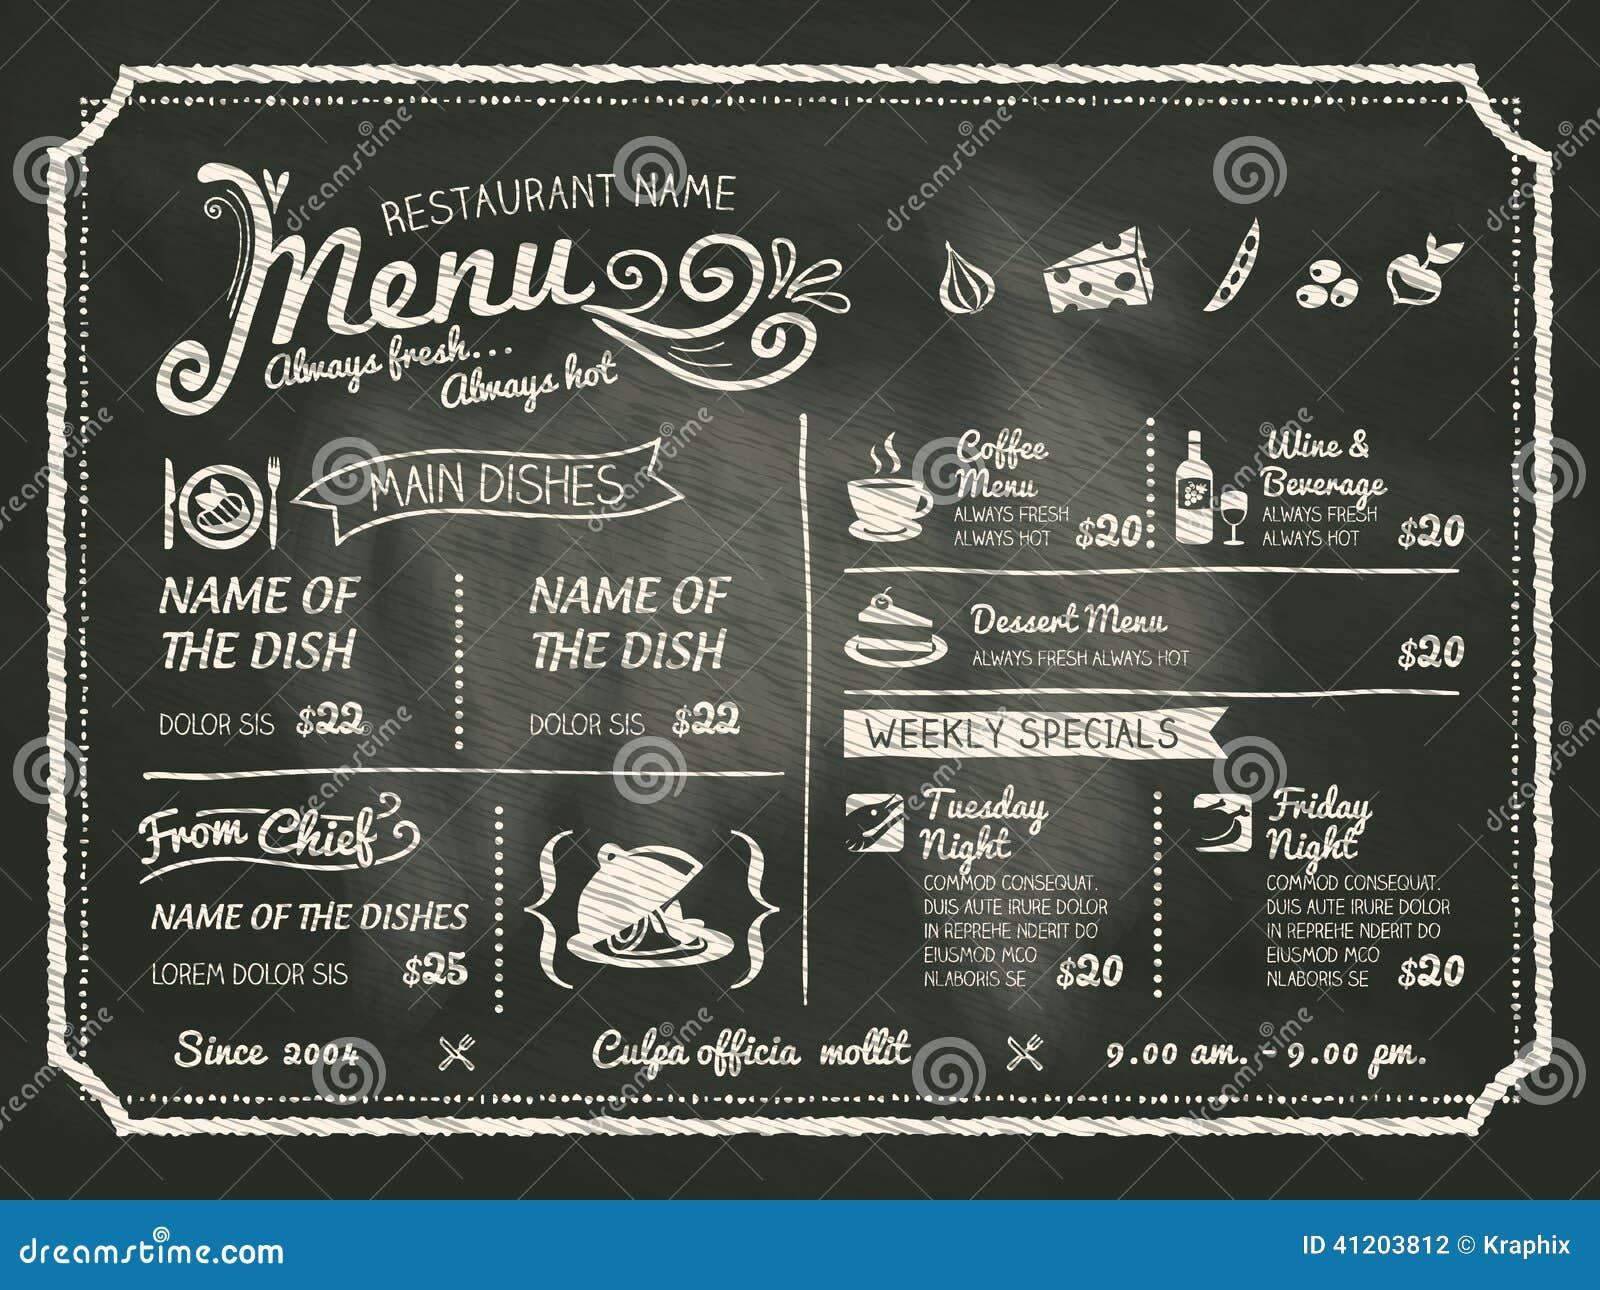 Restaurant Food Menu Design With Chalkboard Background Stock Vector ...